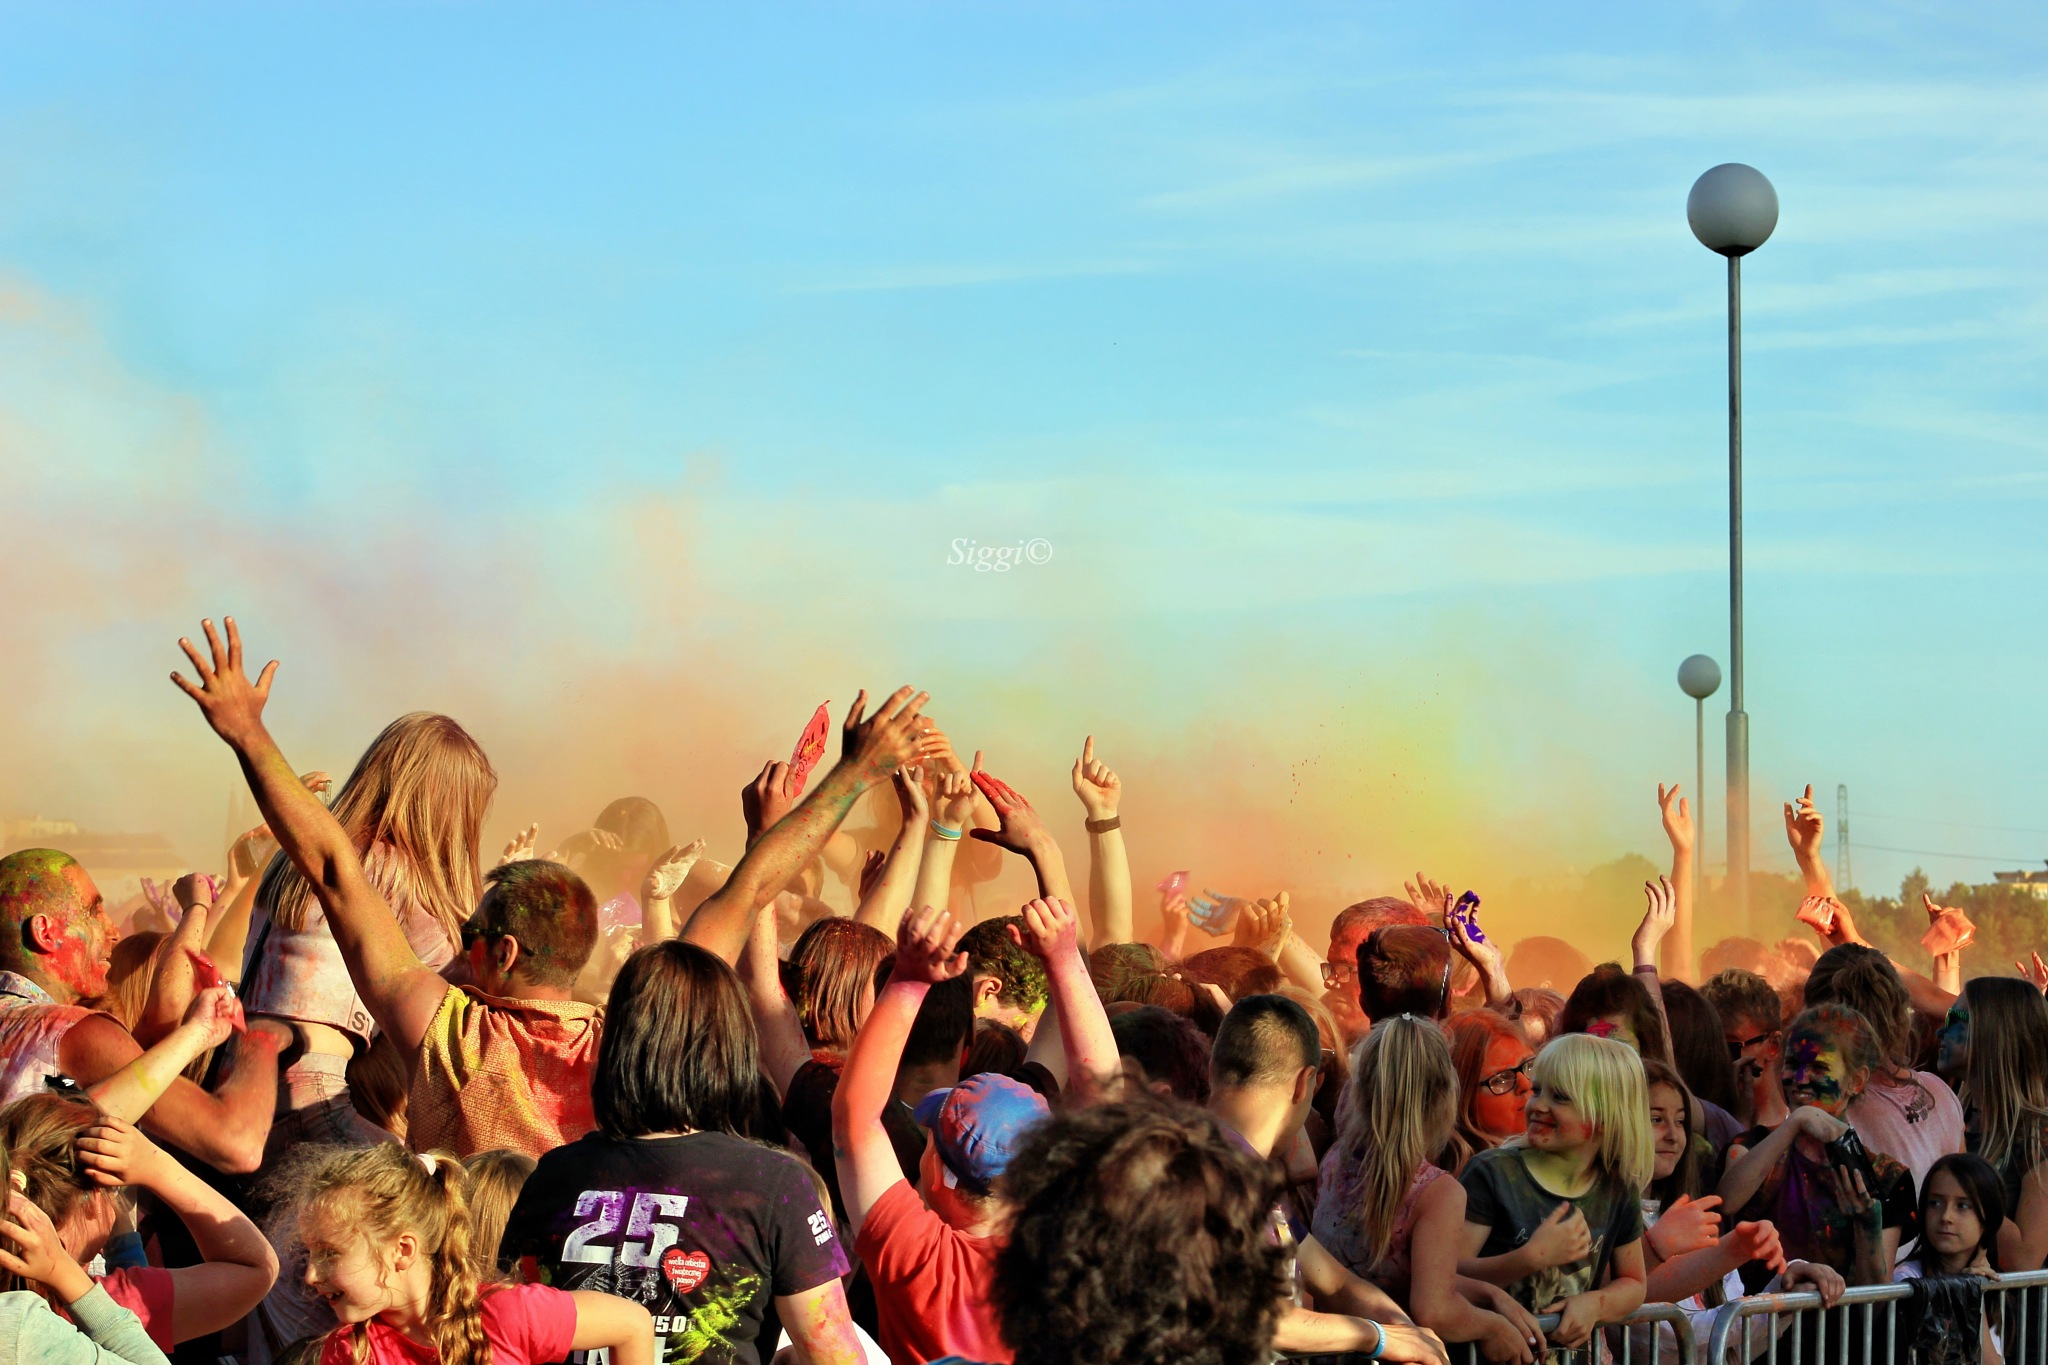 Holi festival by Zbigniew©